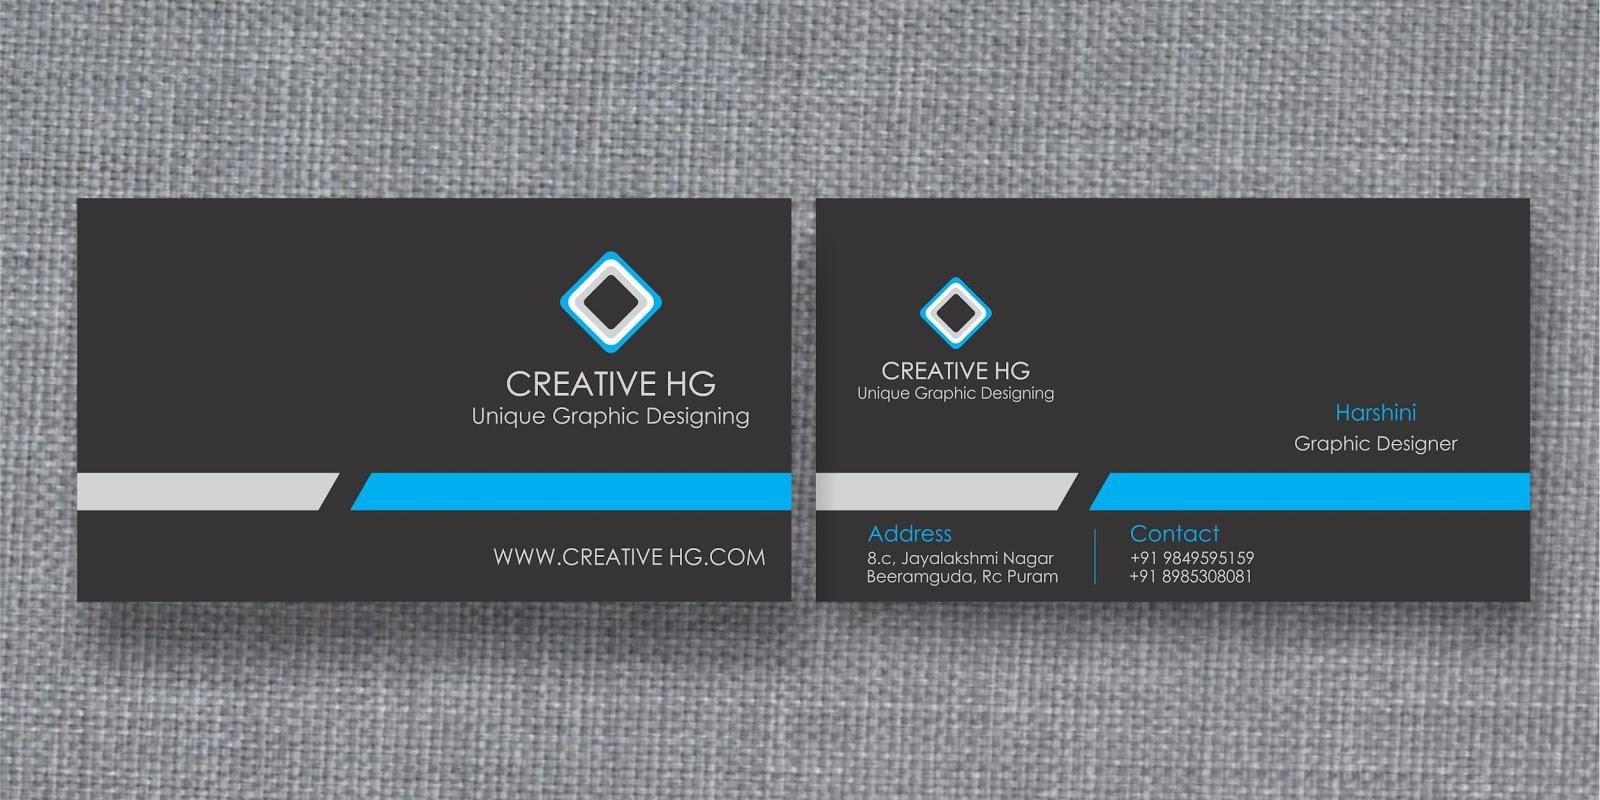 Business card - Harshini Creative Graphics